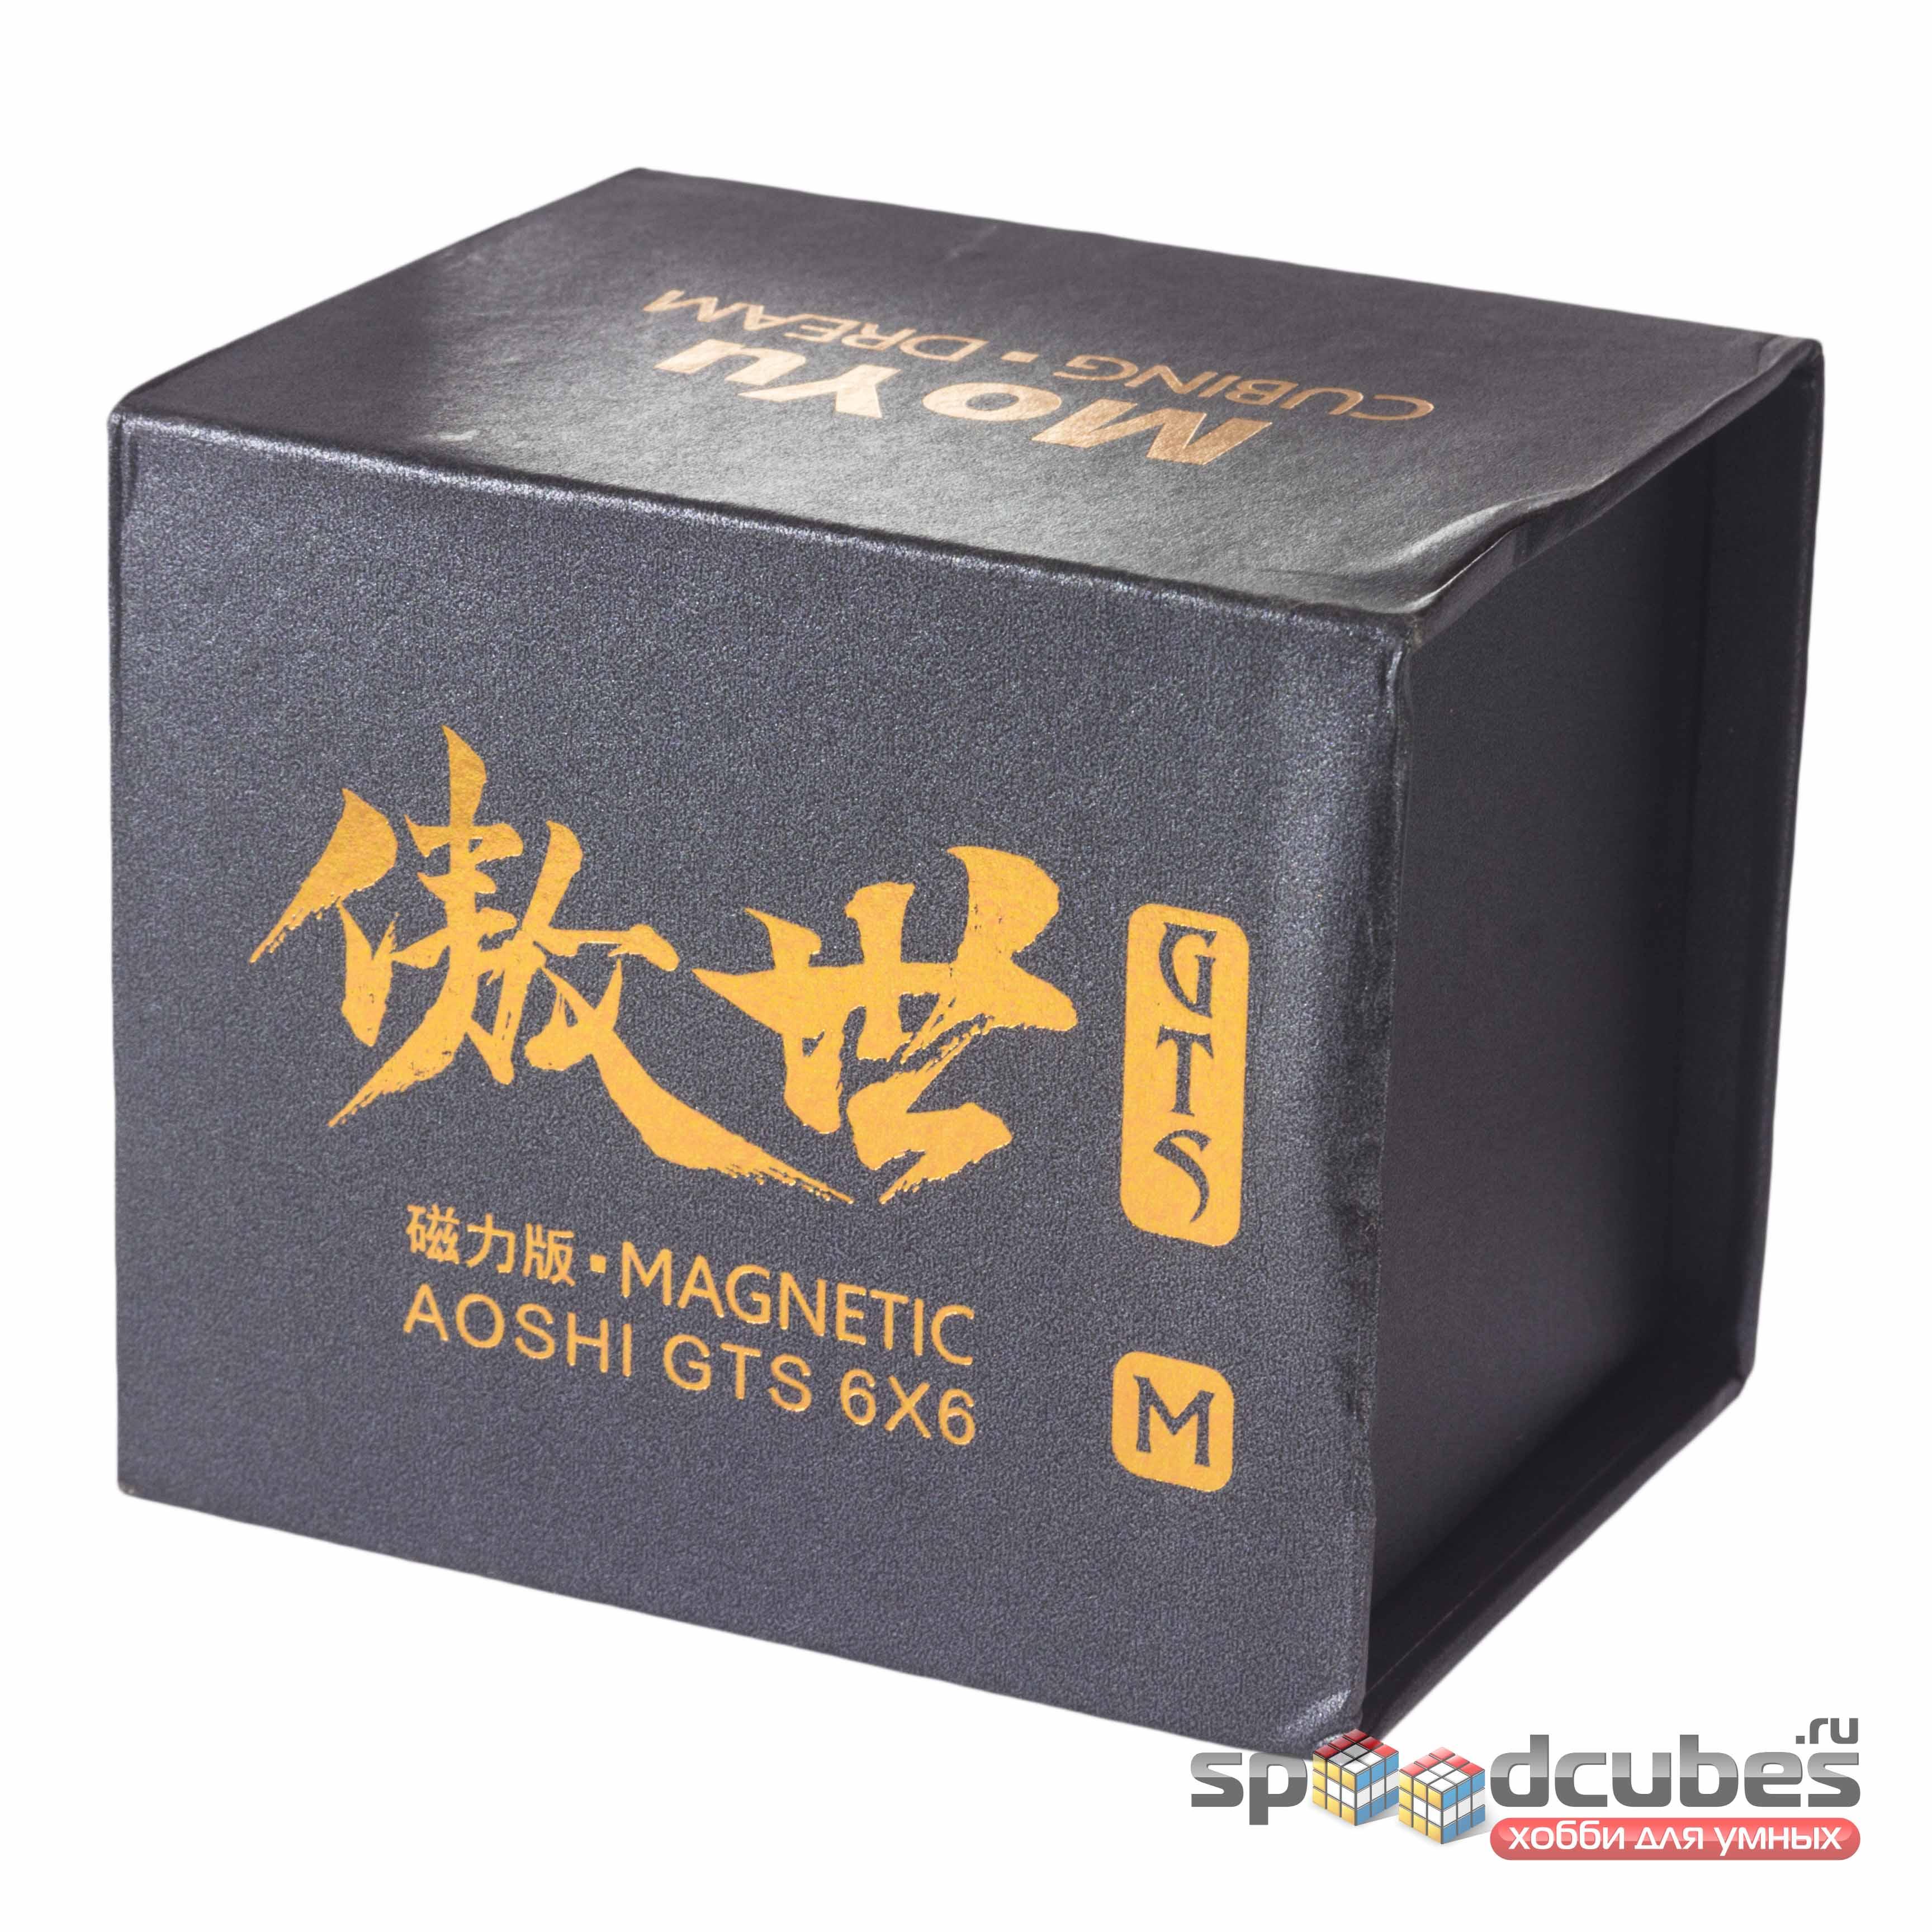 MoYu 6x6x6 Aoshi GTS M Black 1